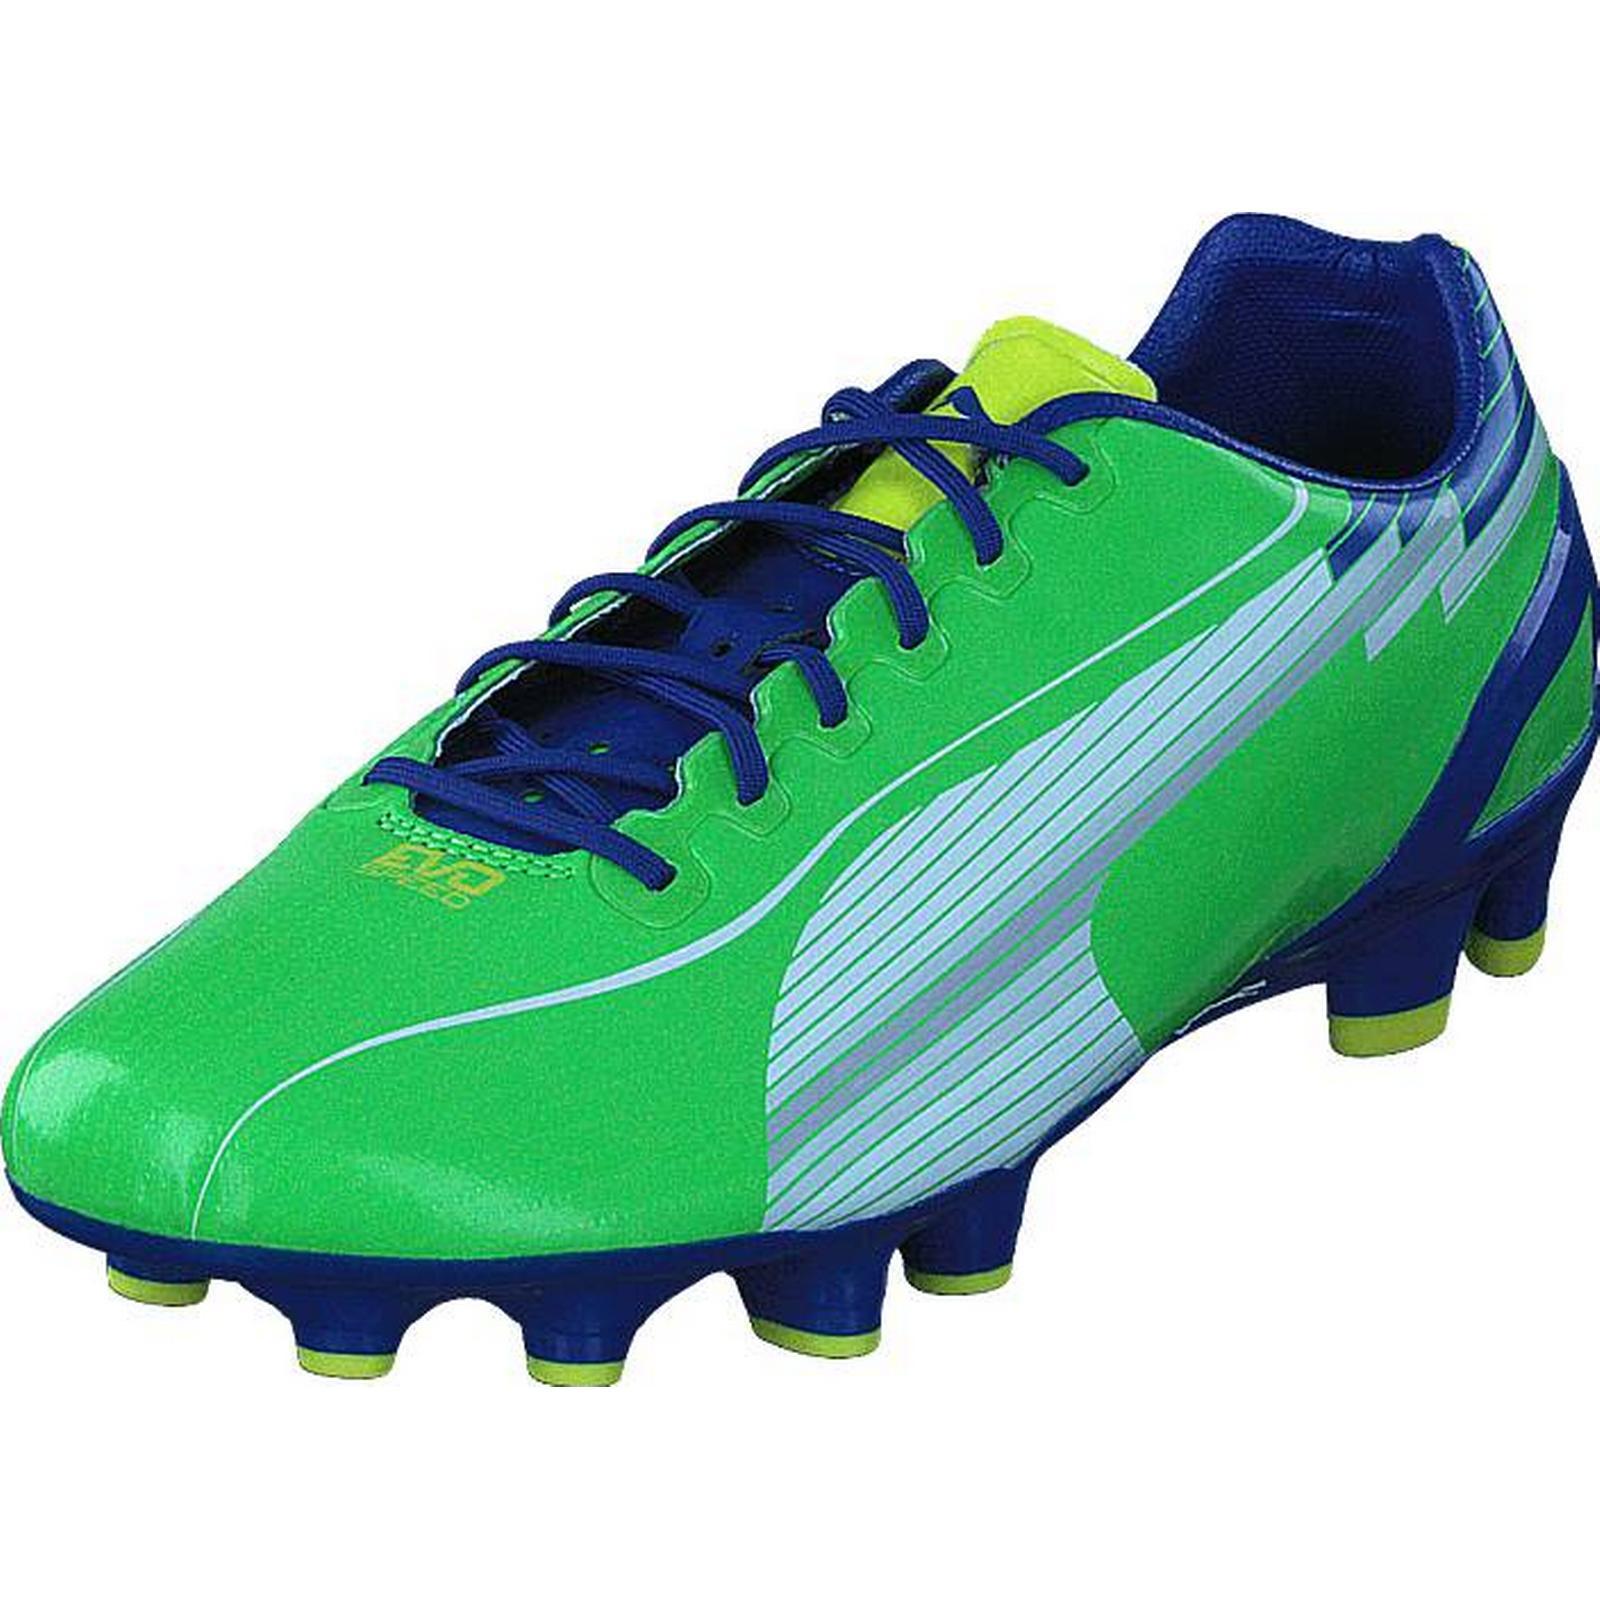 Puma 1 Evospeed 1 Puma FG Jasmine Green, Shoes, Trainers & Sport Shoes , Low-top Trainers, Blue, Green, Male, 41 d00c88